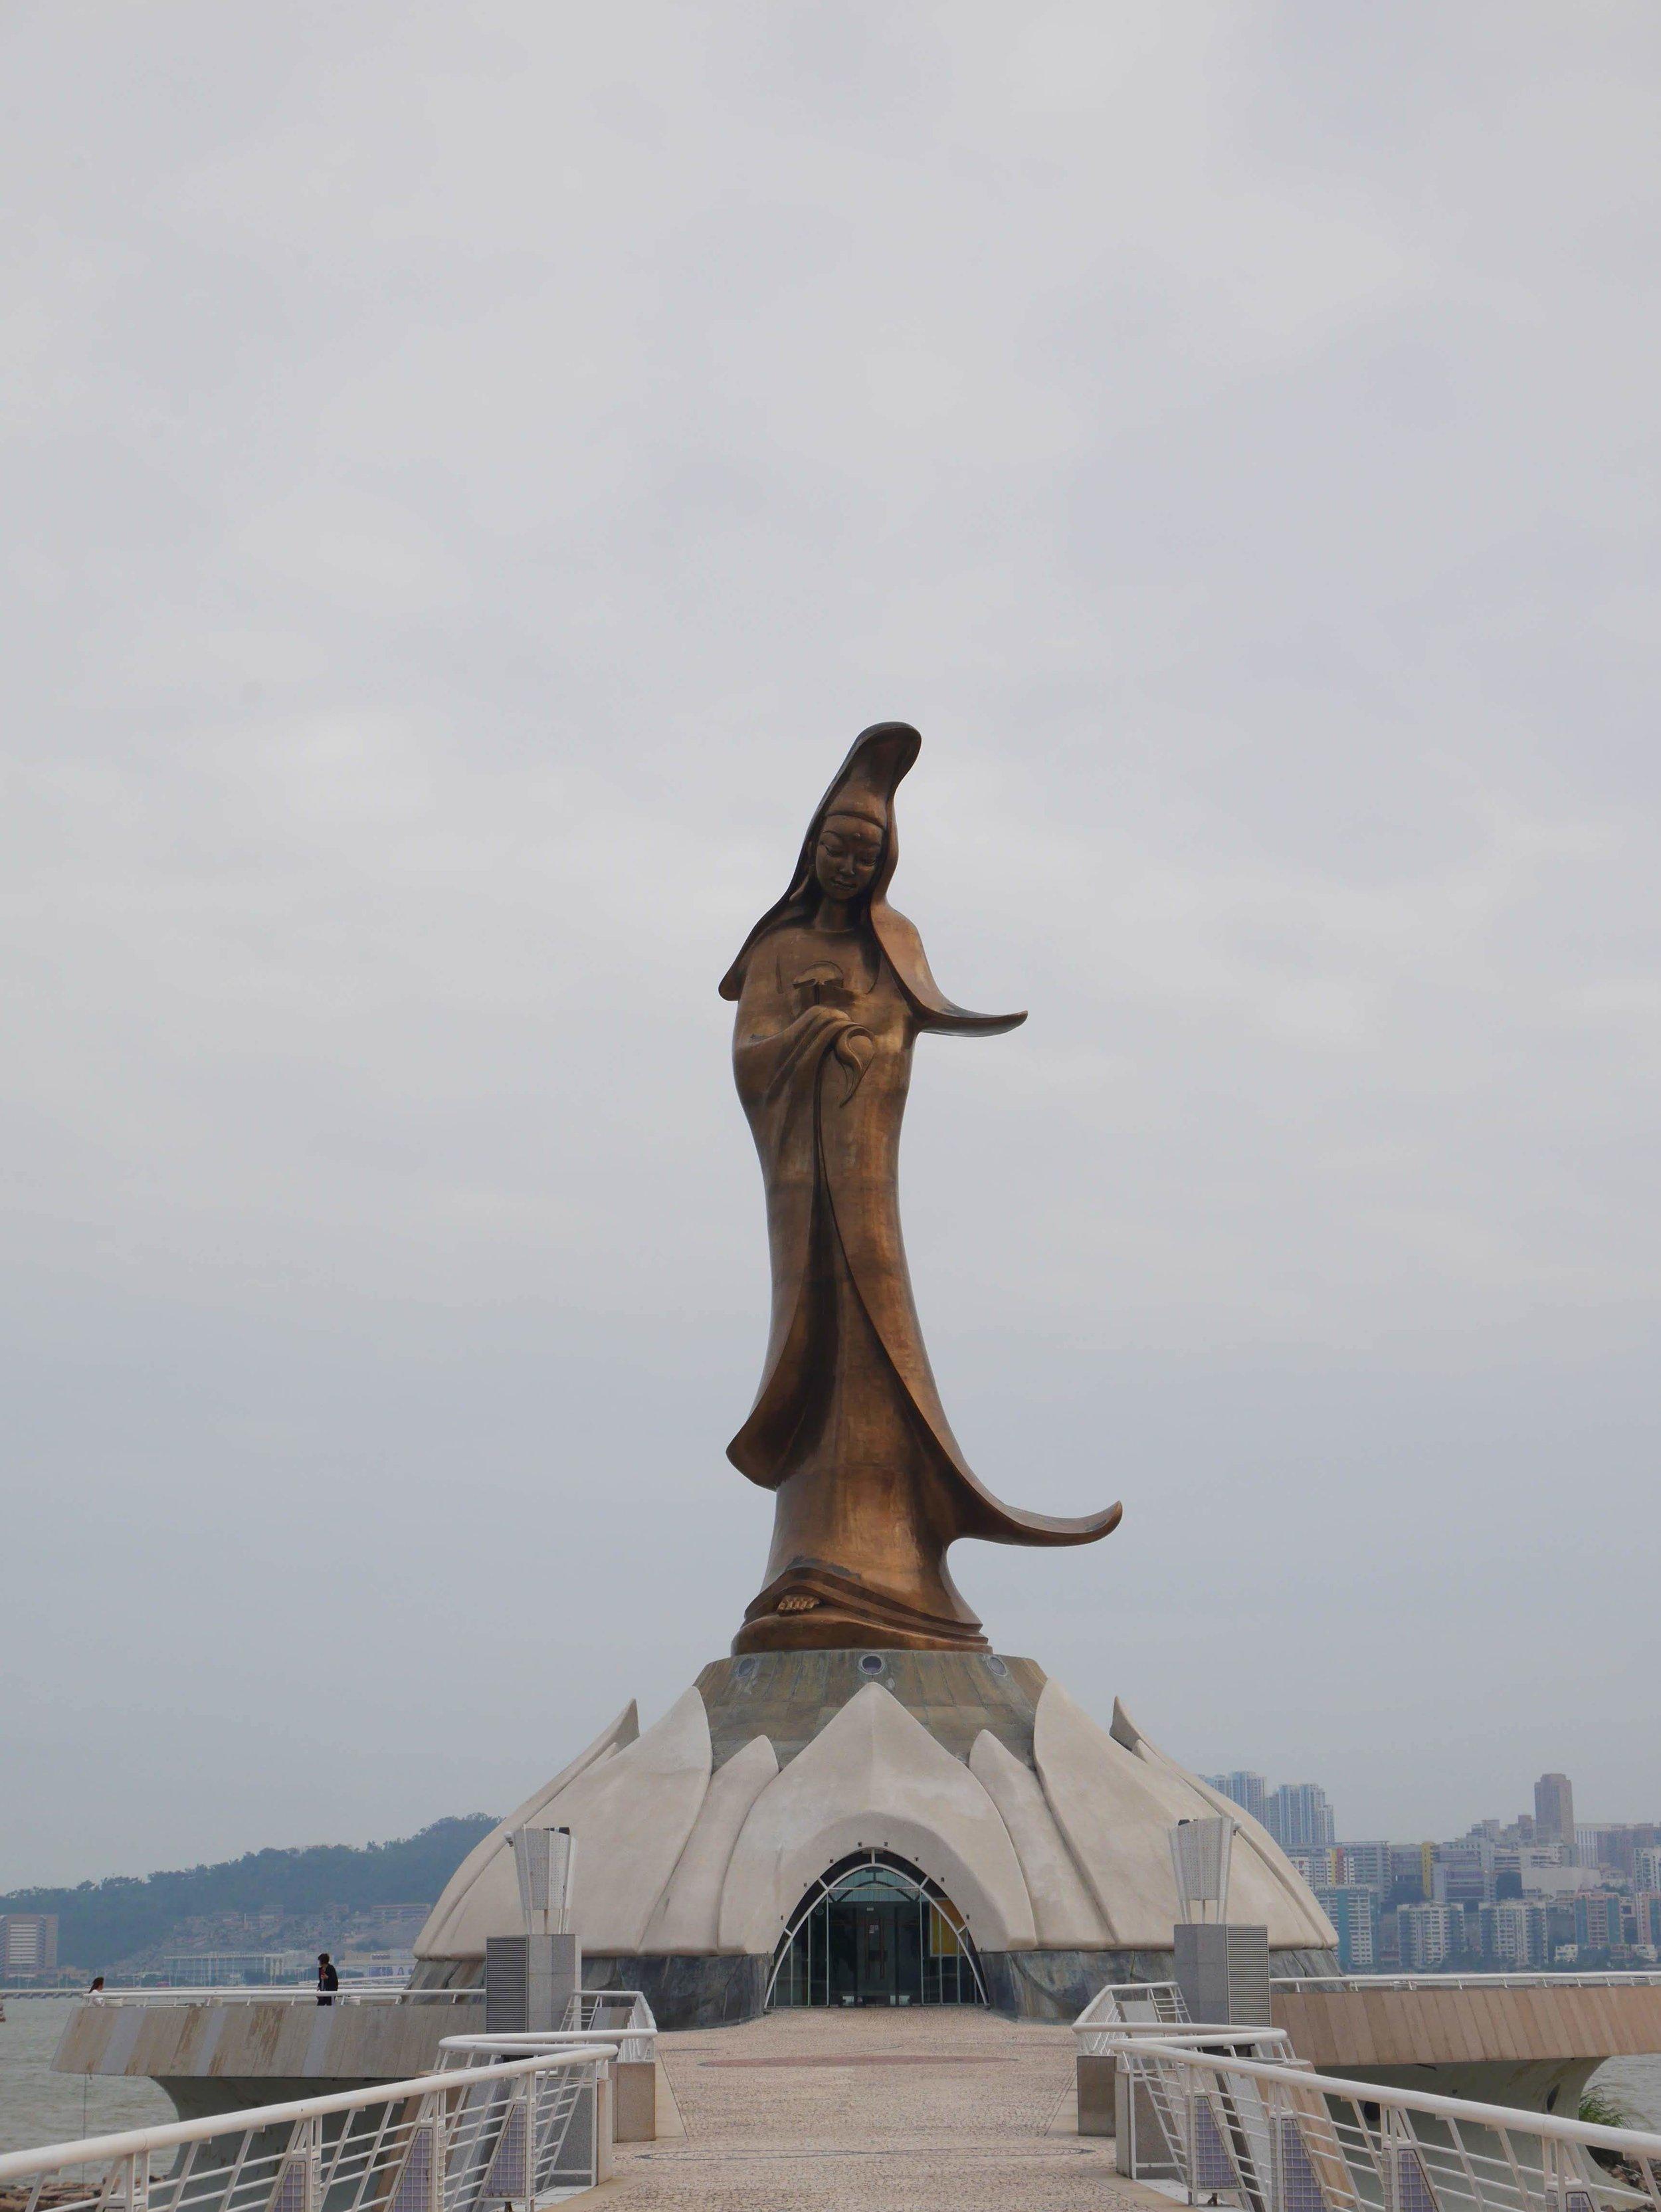 Statue of Kuan Iam in the harbor at Macau, China